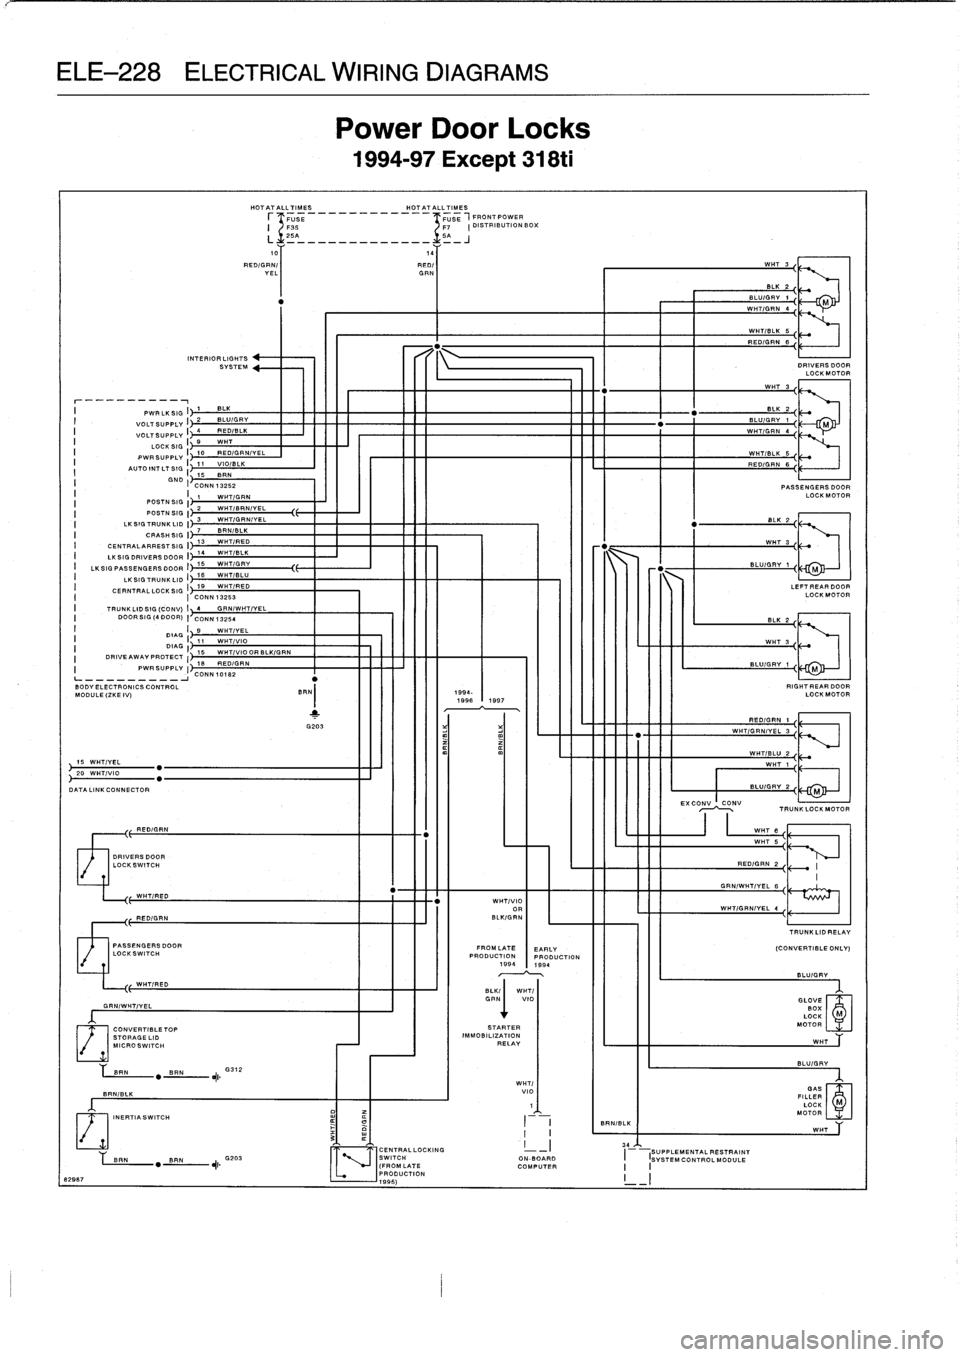 Ehc Wiring Diagram 1999 Bmw 540i Auto Electrical Wiring Diagram 1999 BMW  323I Ehc Wiring Diagram 1999 Bmw 540i